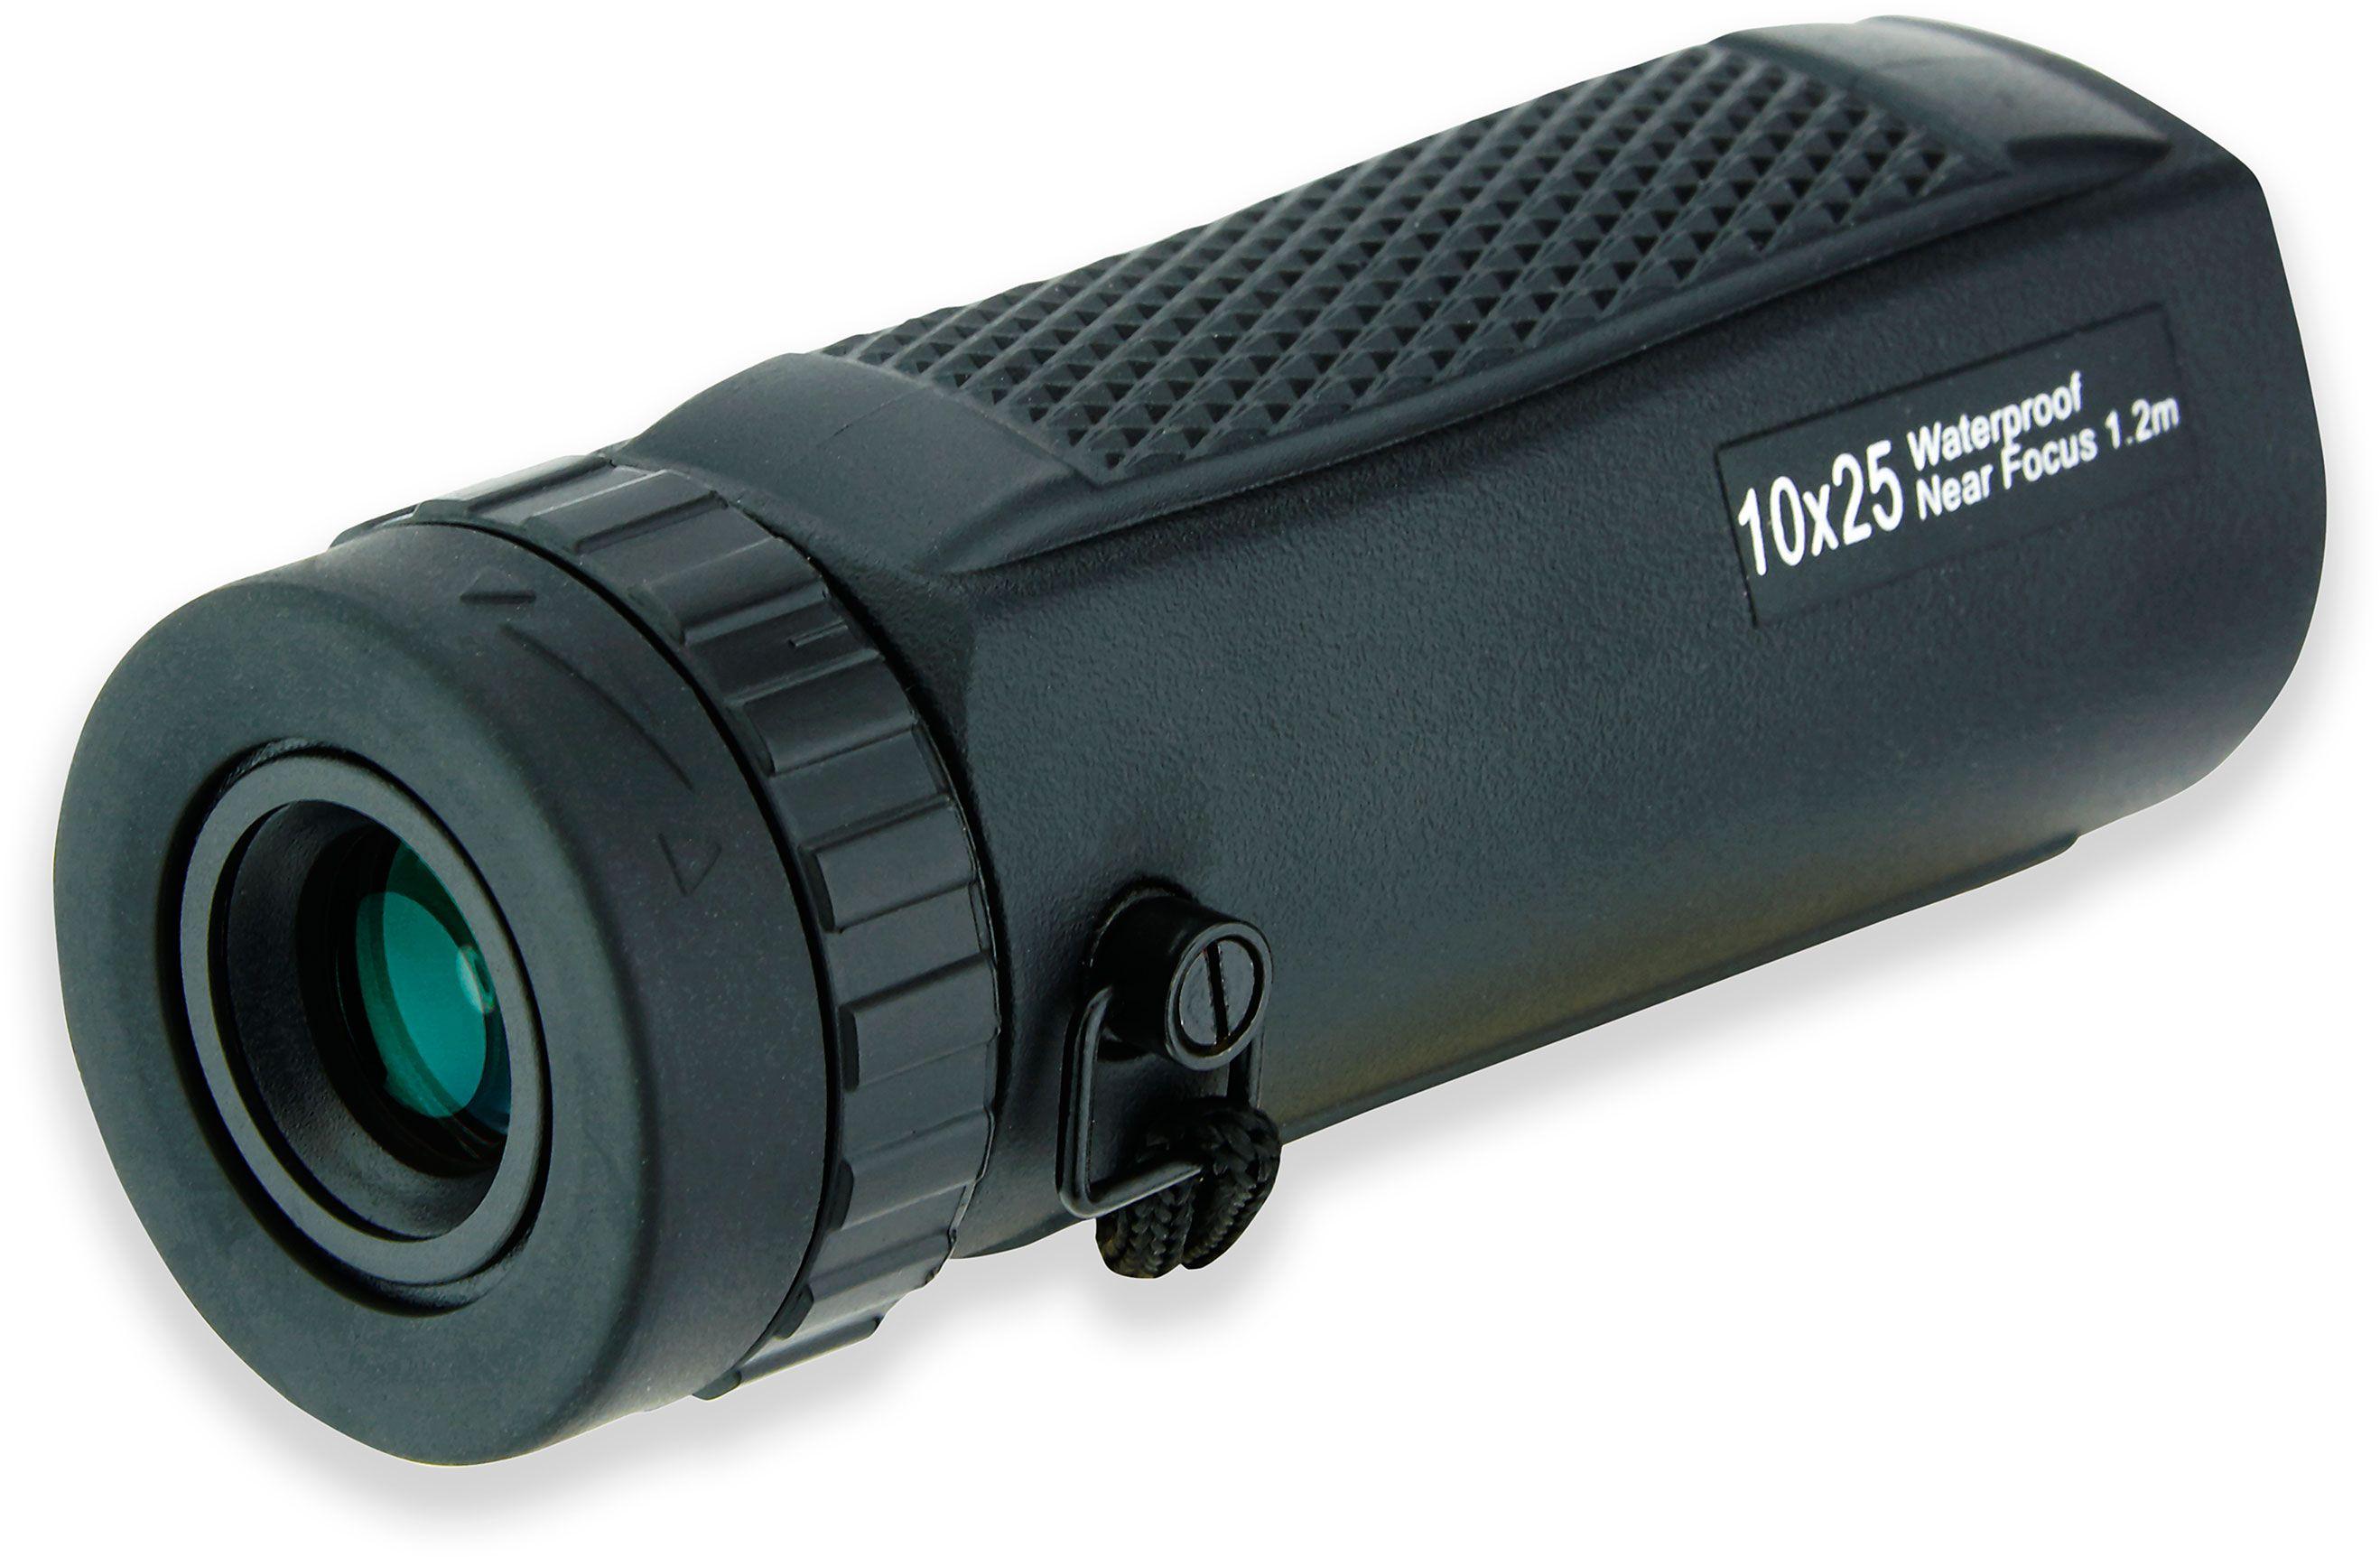 Carson Optical WM-025 BlackWave Waterproof Monocular